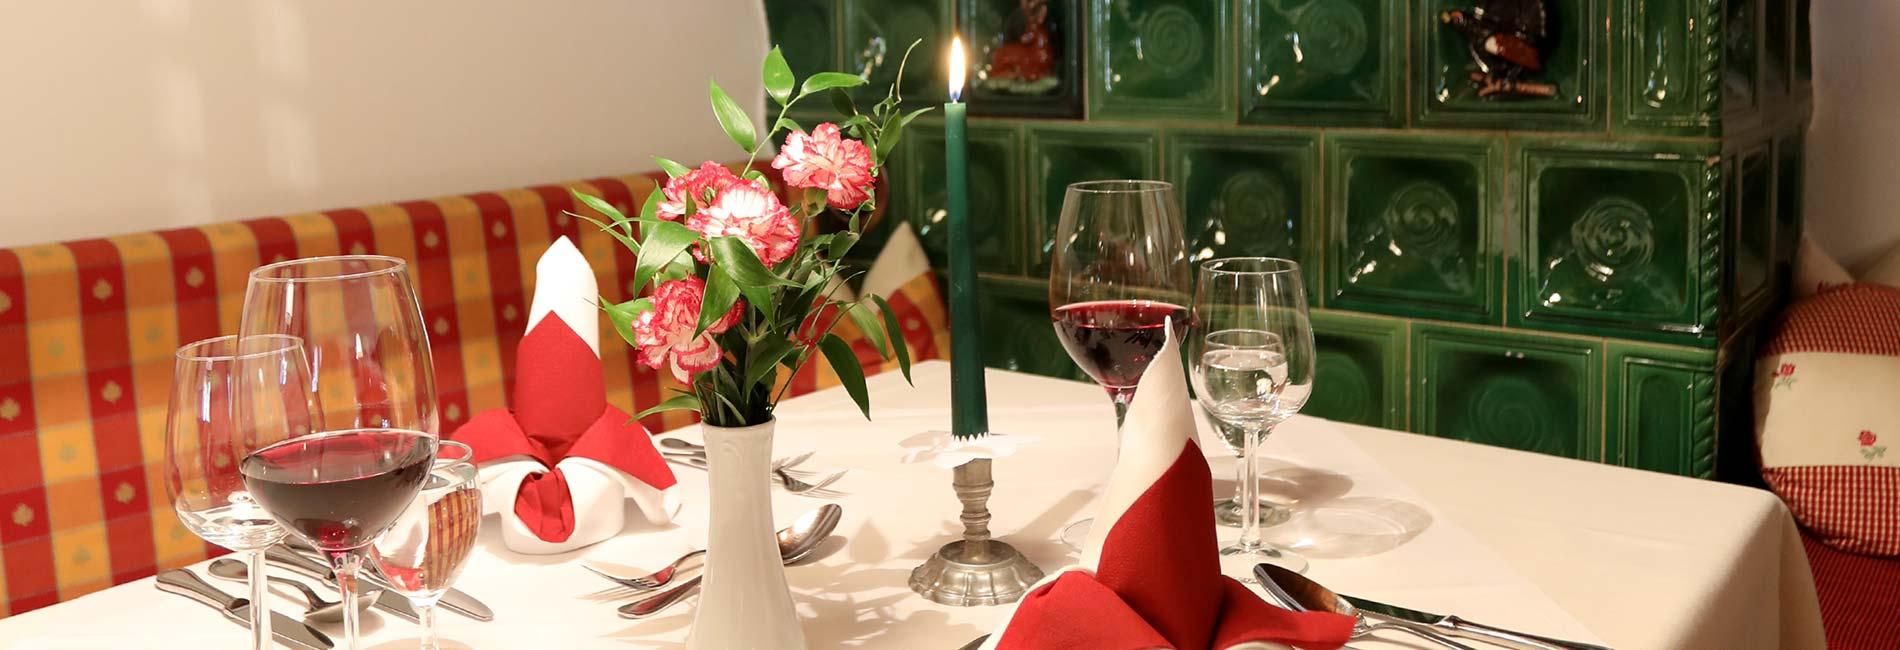 Kulinarium im Hotel Almhof in Neustift im Stubaital in Tirol